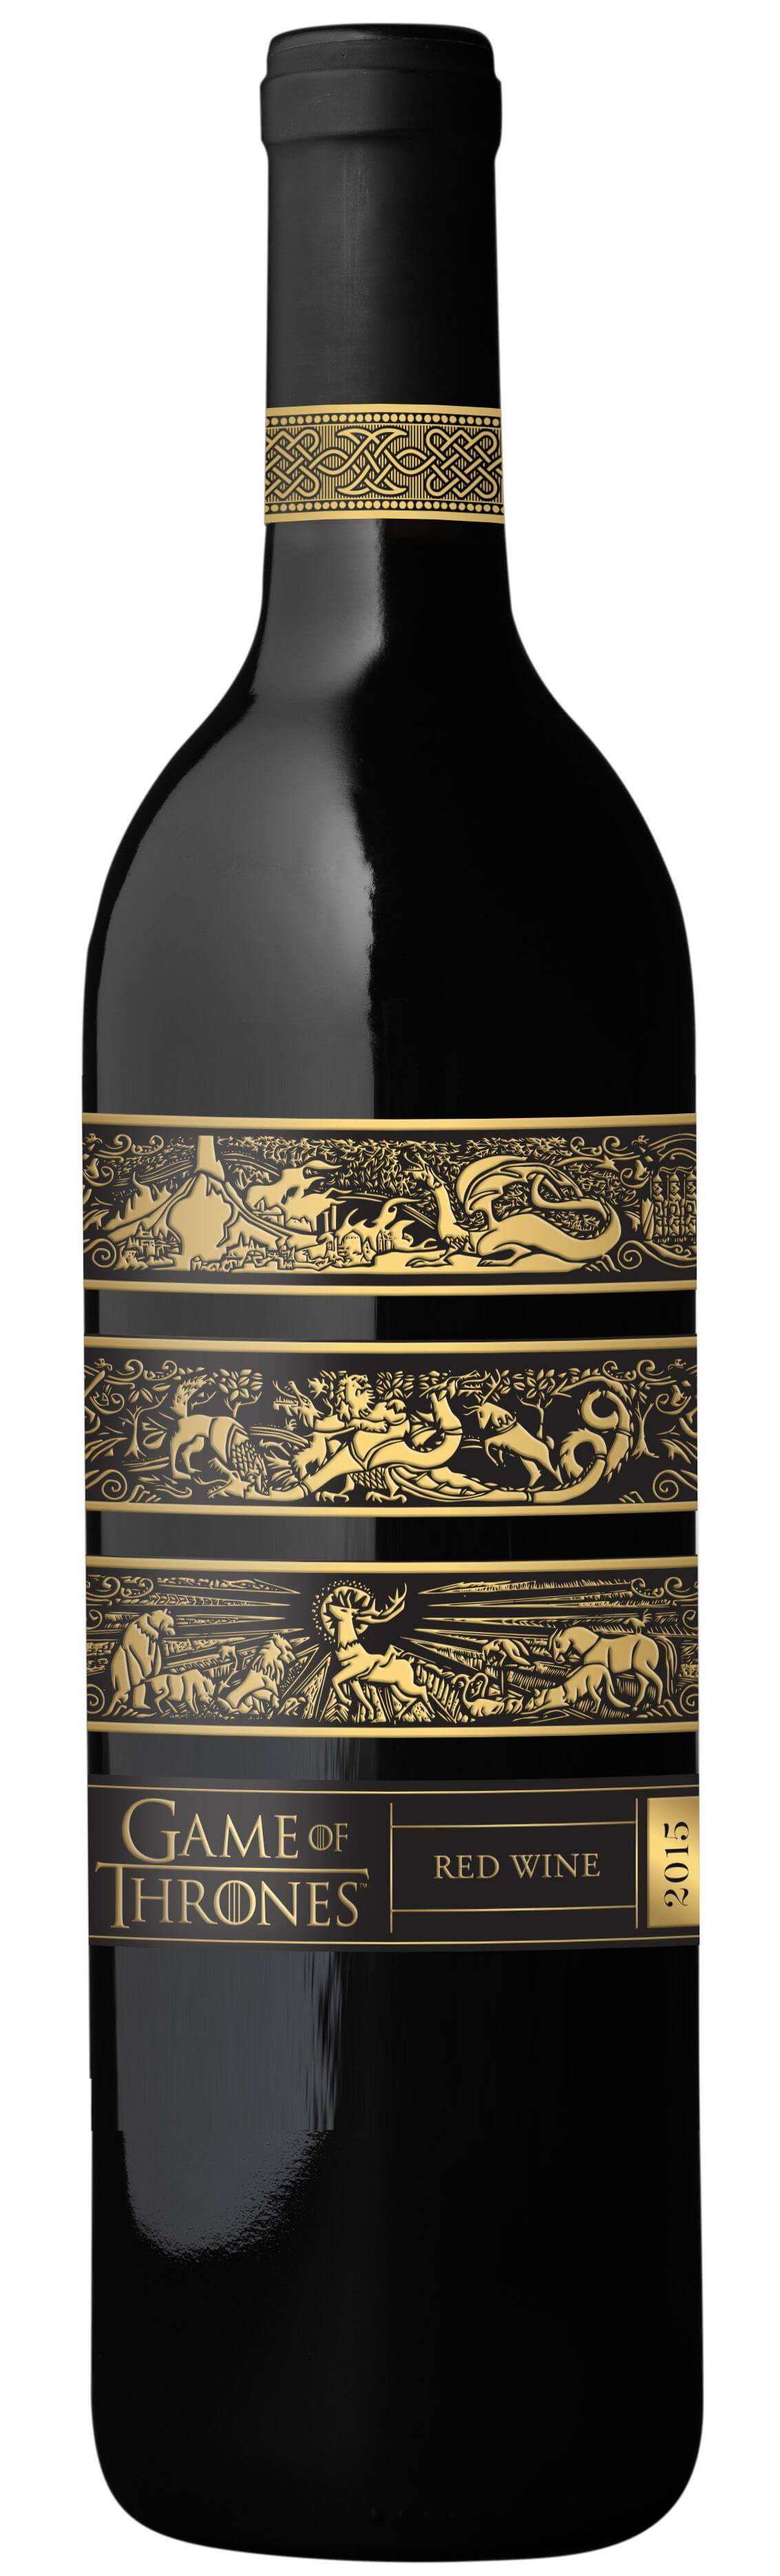 Game Of Thrones Wine 4 (1)